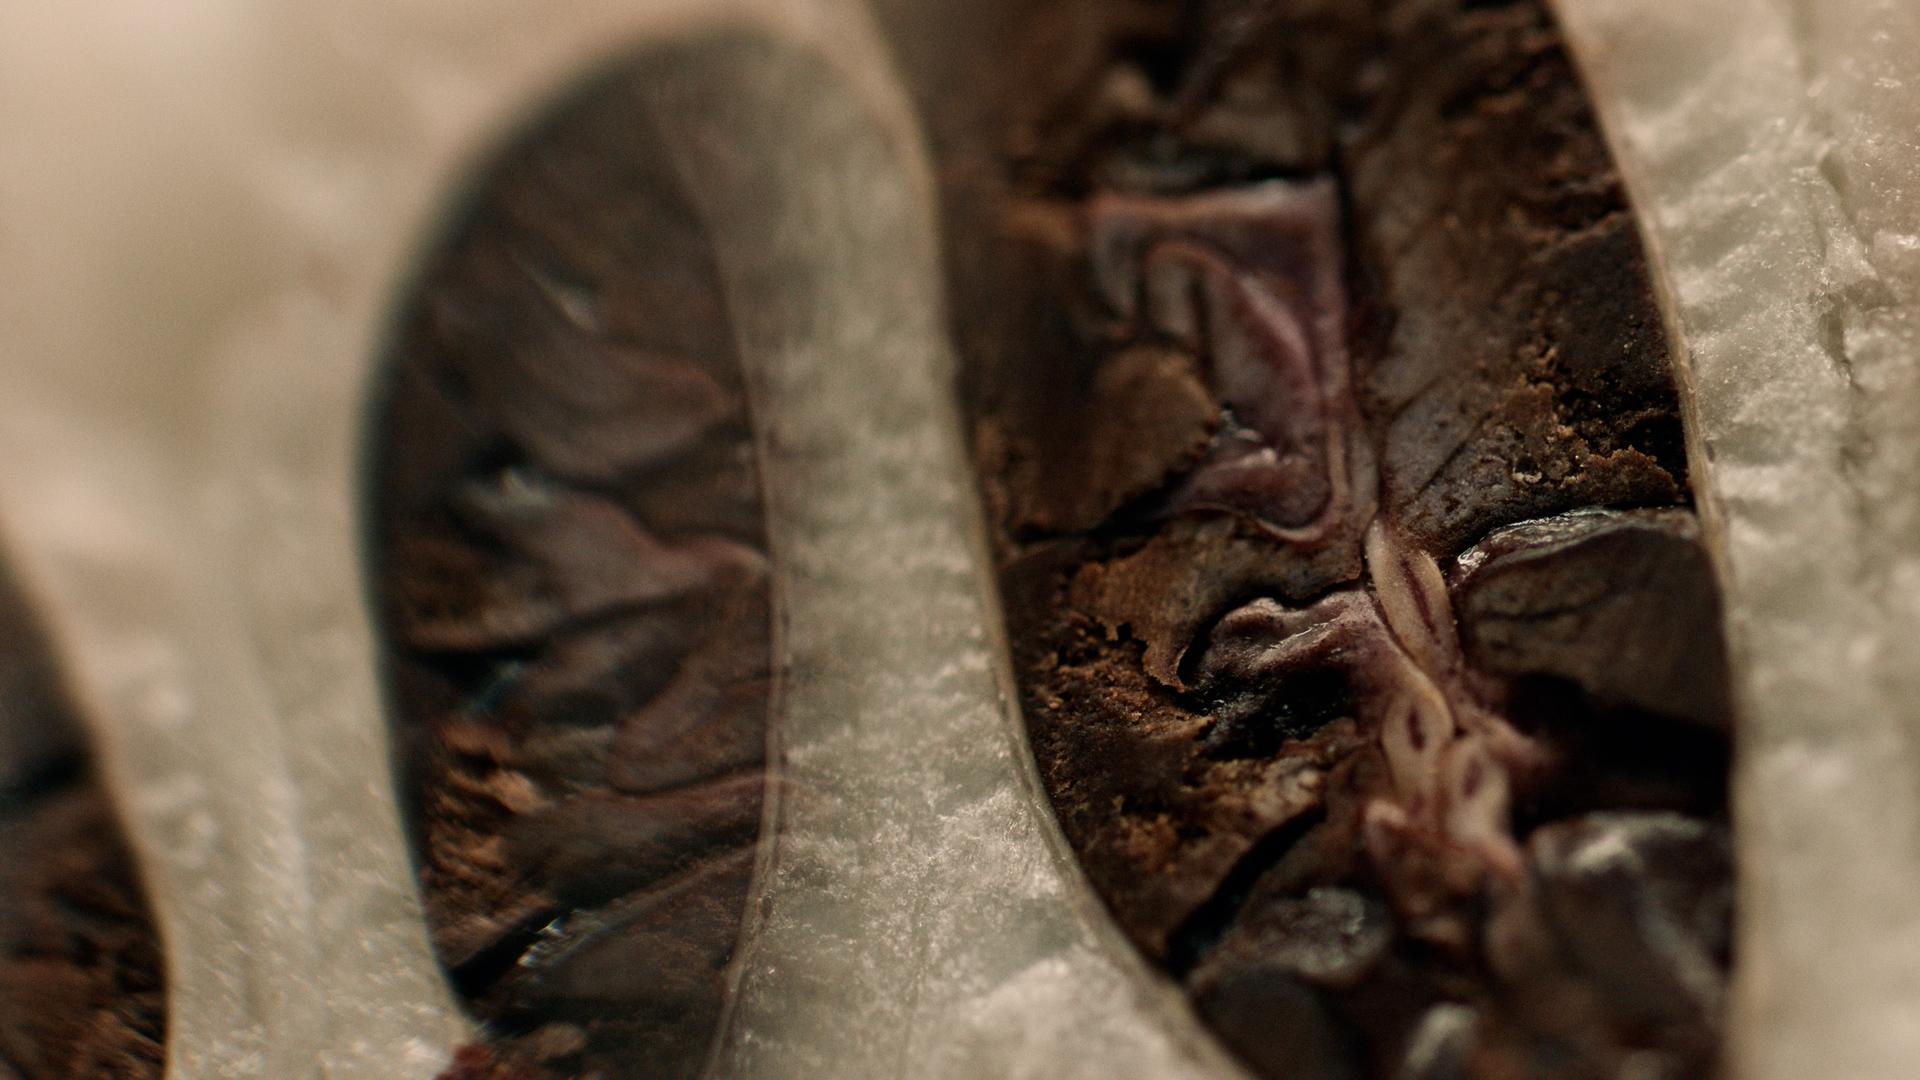 portfolio/theartofchocolate/chocolate_jorrit-stollman_04.jpg